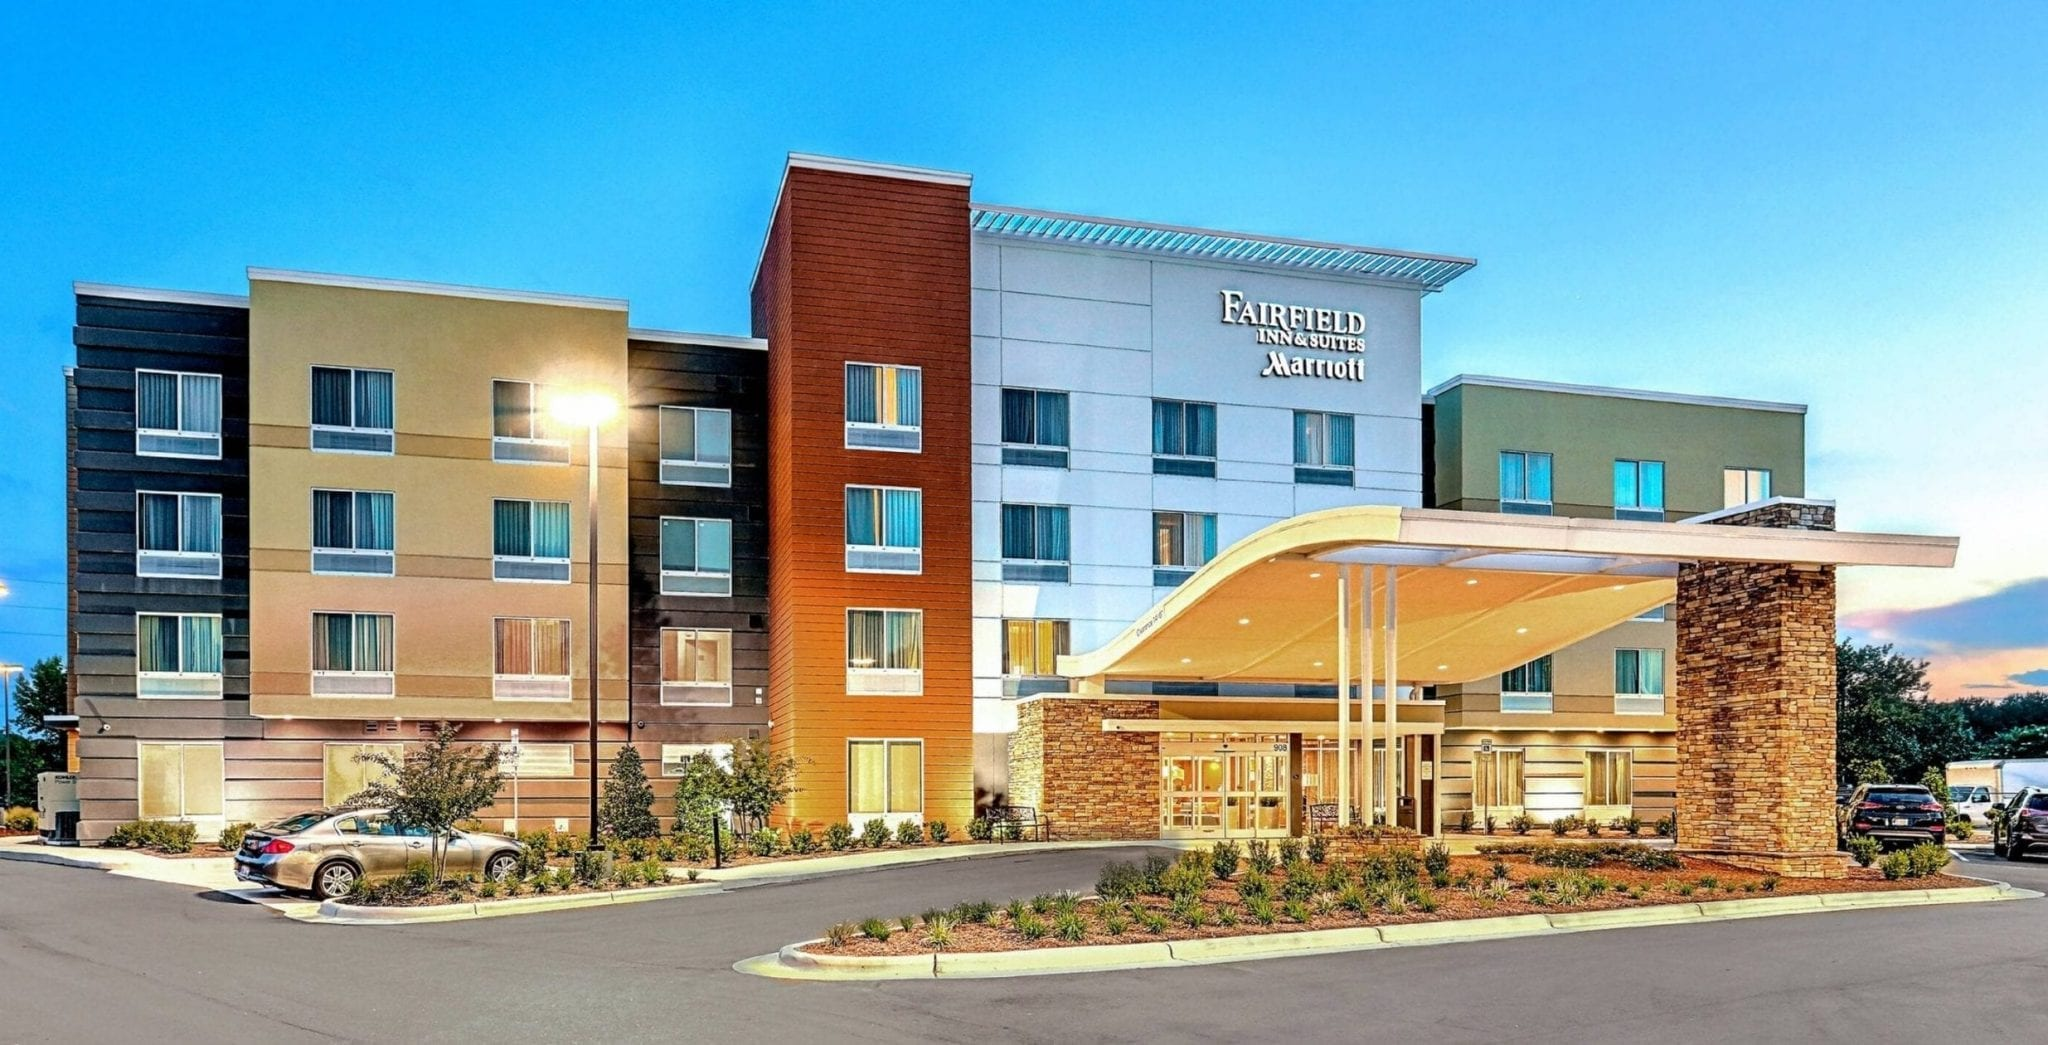 Fairfield Inn Suites Greenville NC Architect